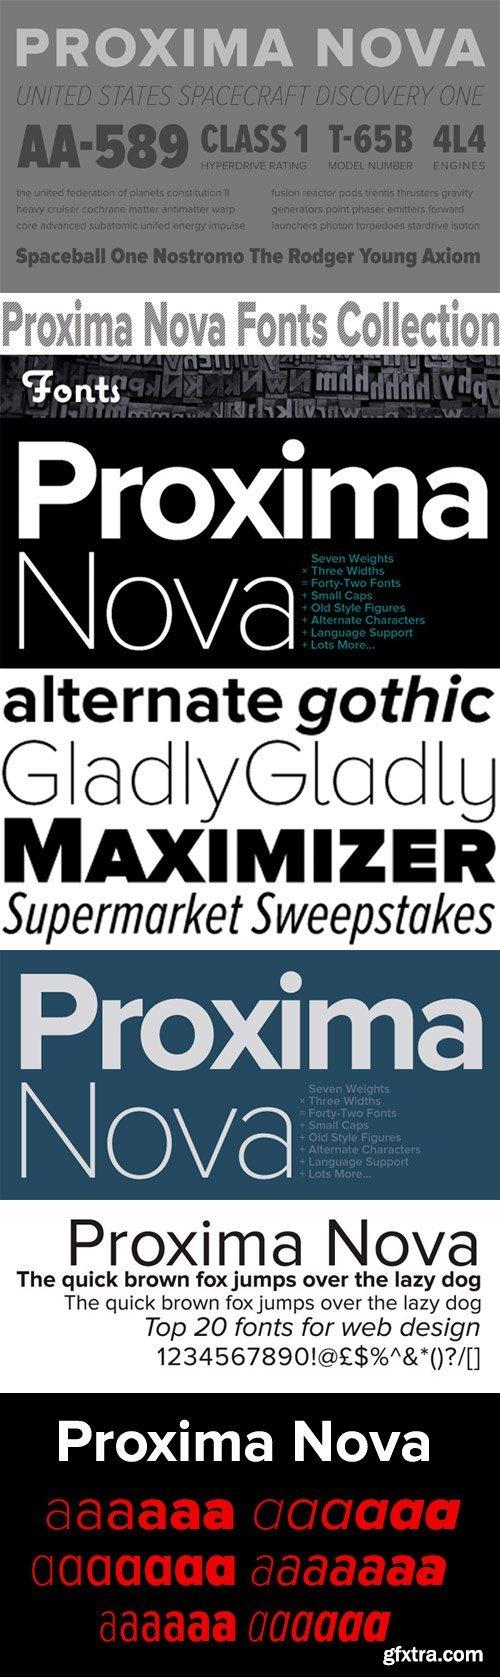 Proxima Nova Font Family - 126 Fonts for $644